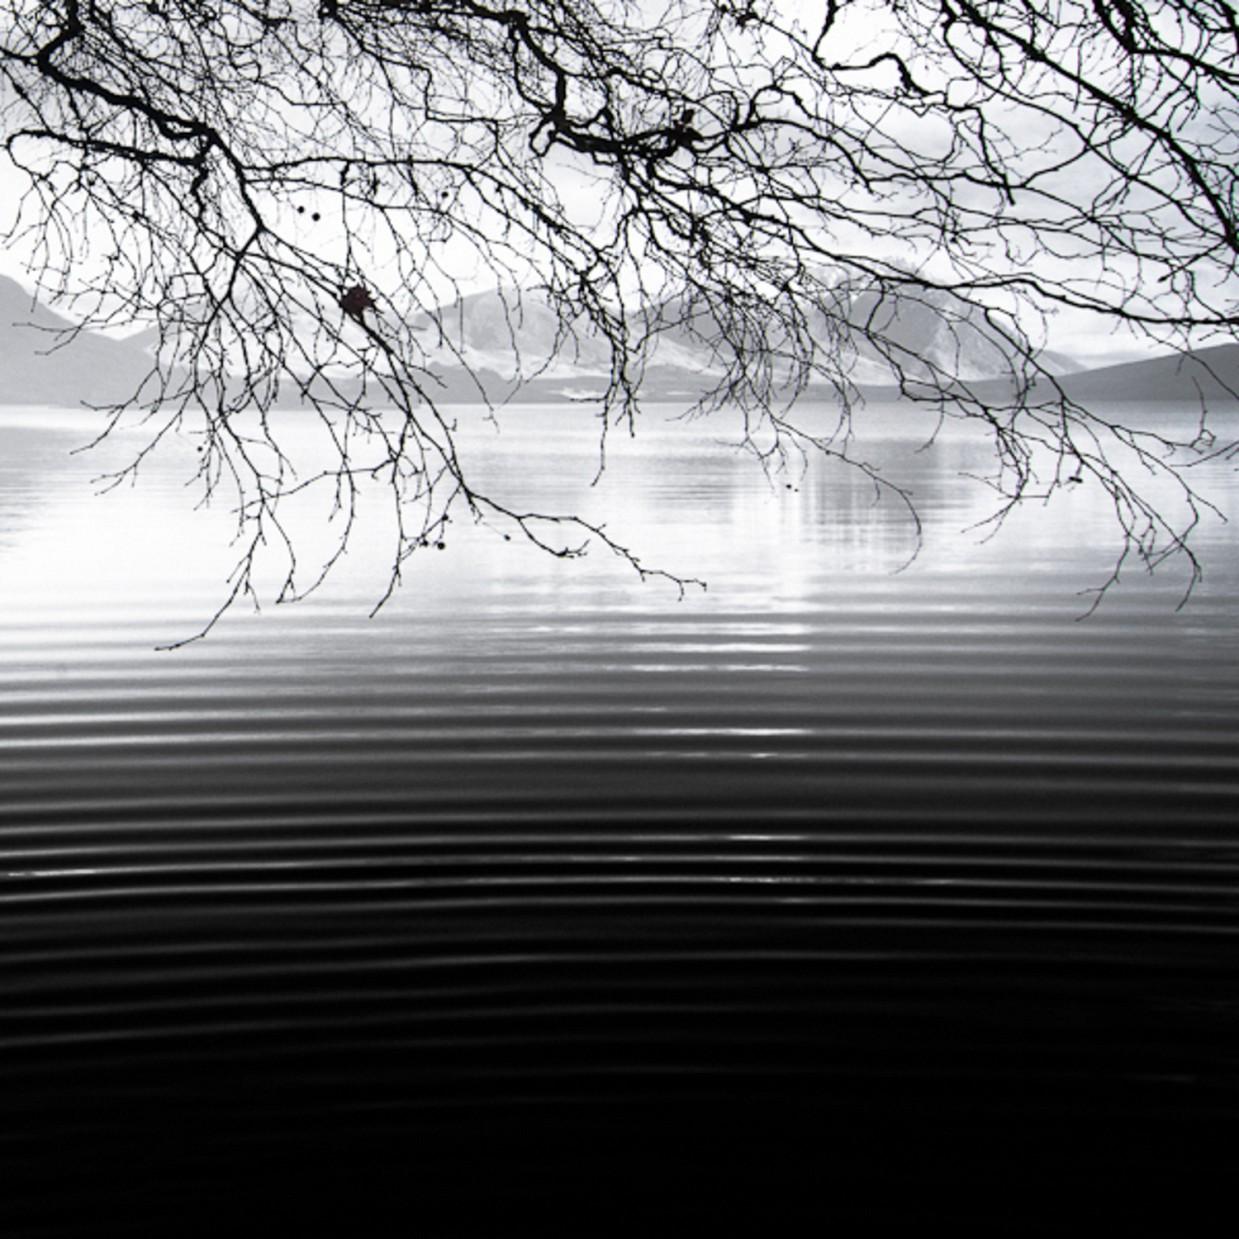 fotograf-Zoltan-Bekefi_1